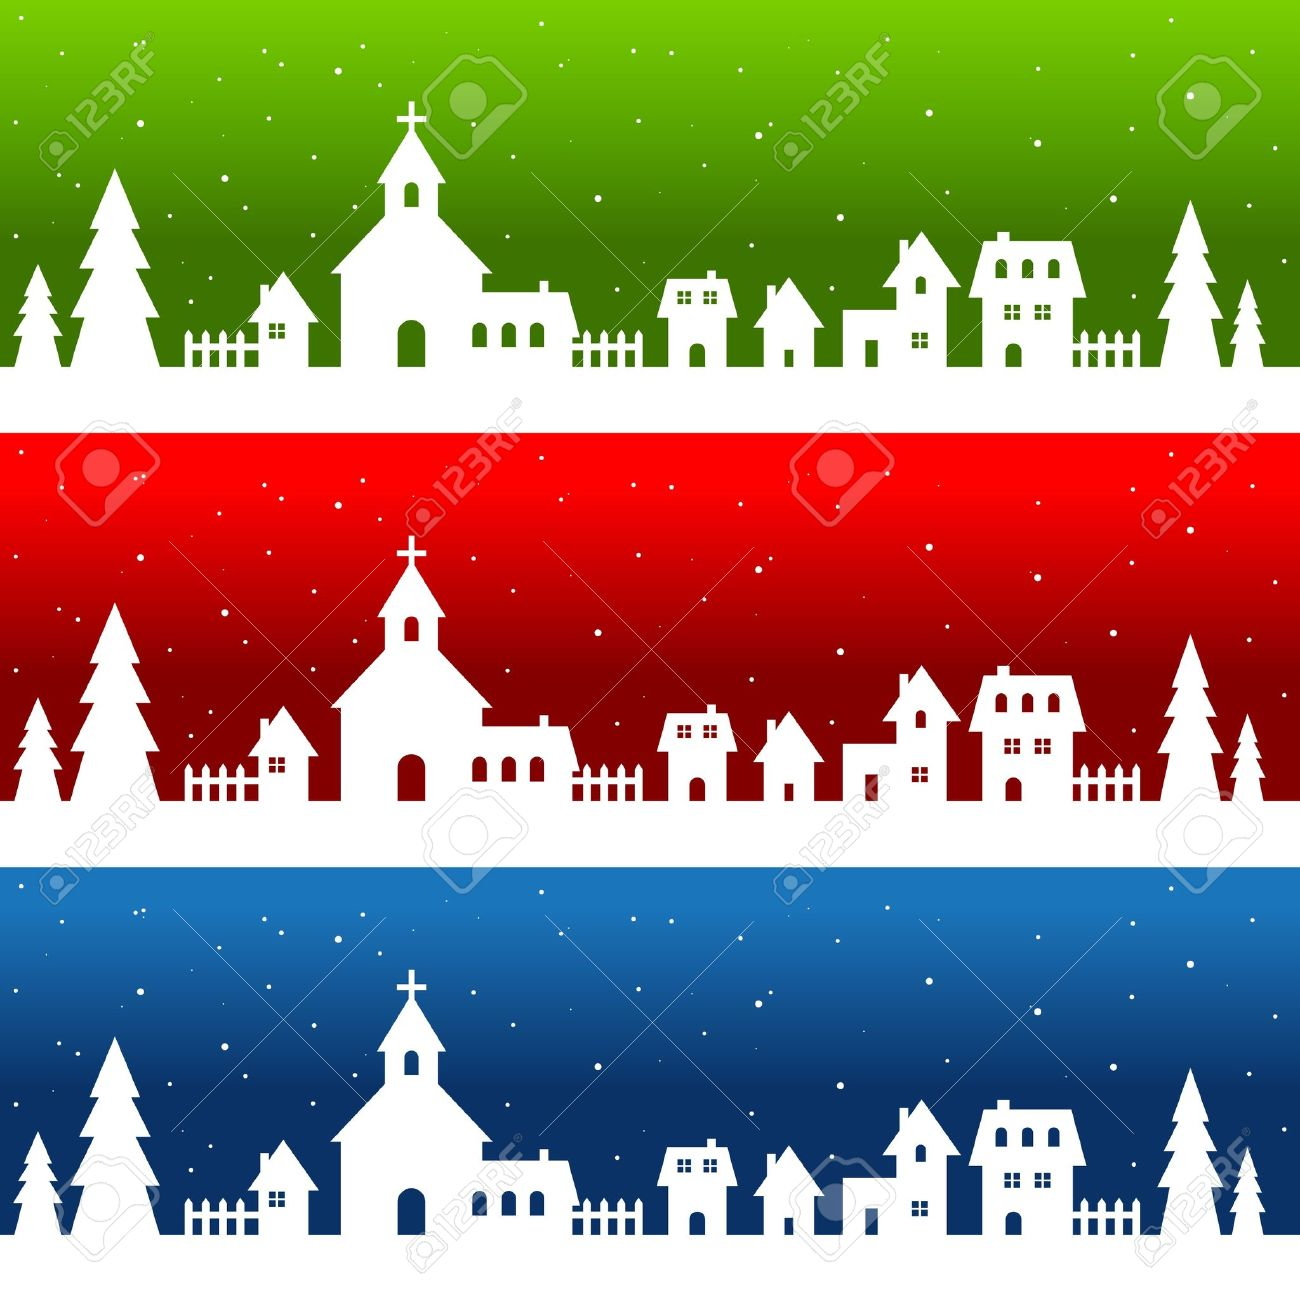 White Silhouette Christmas Village Stock Vector - 11814233